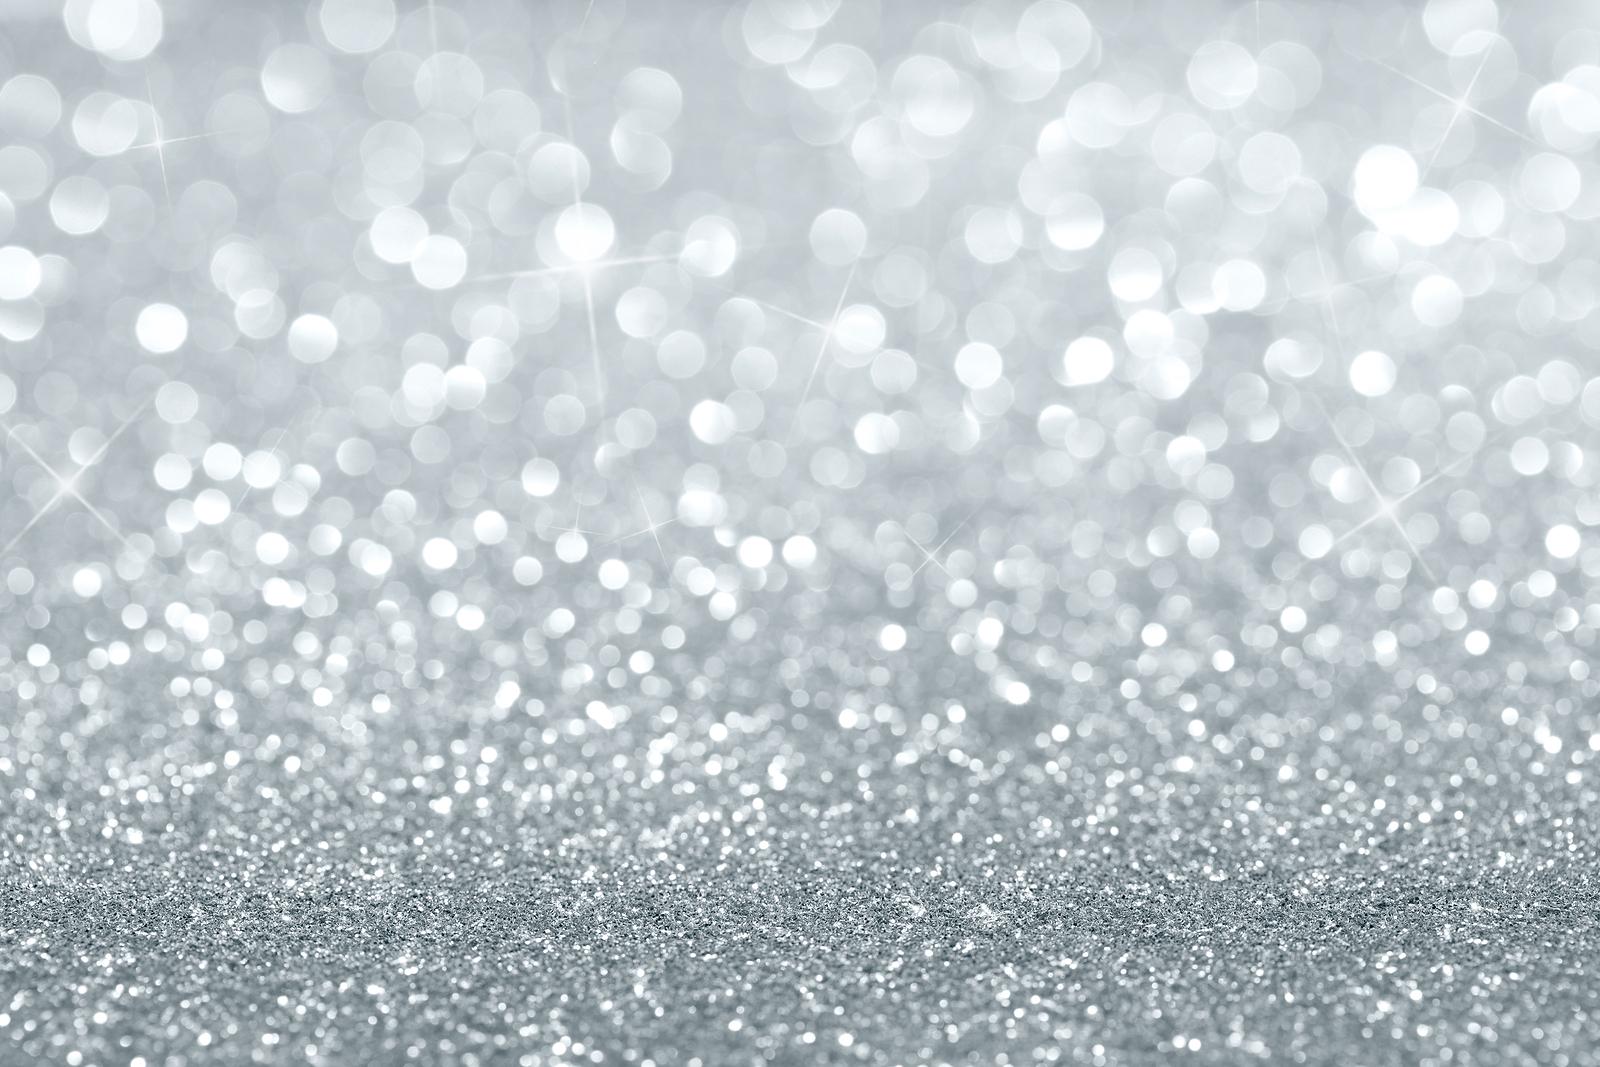 Silver Glitter Desktop Backgrounds HD wallpaper background 1600x1067